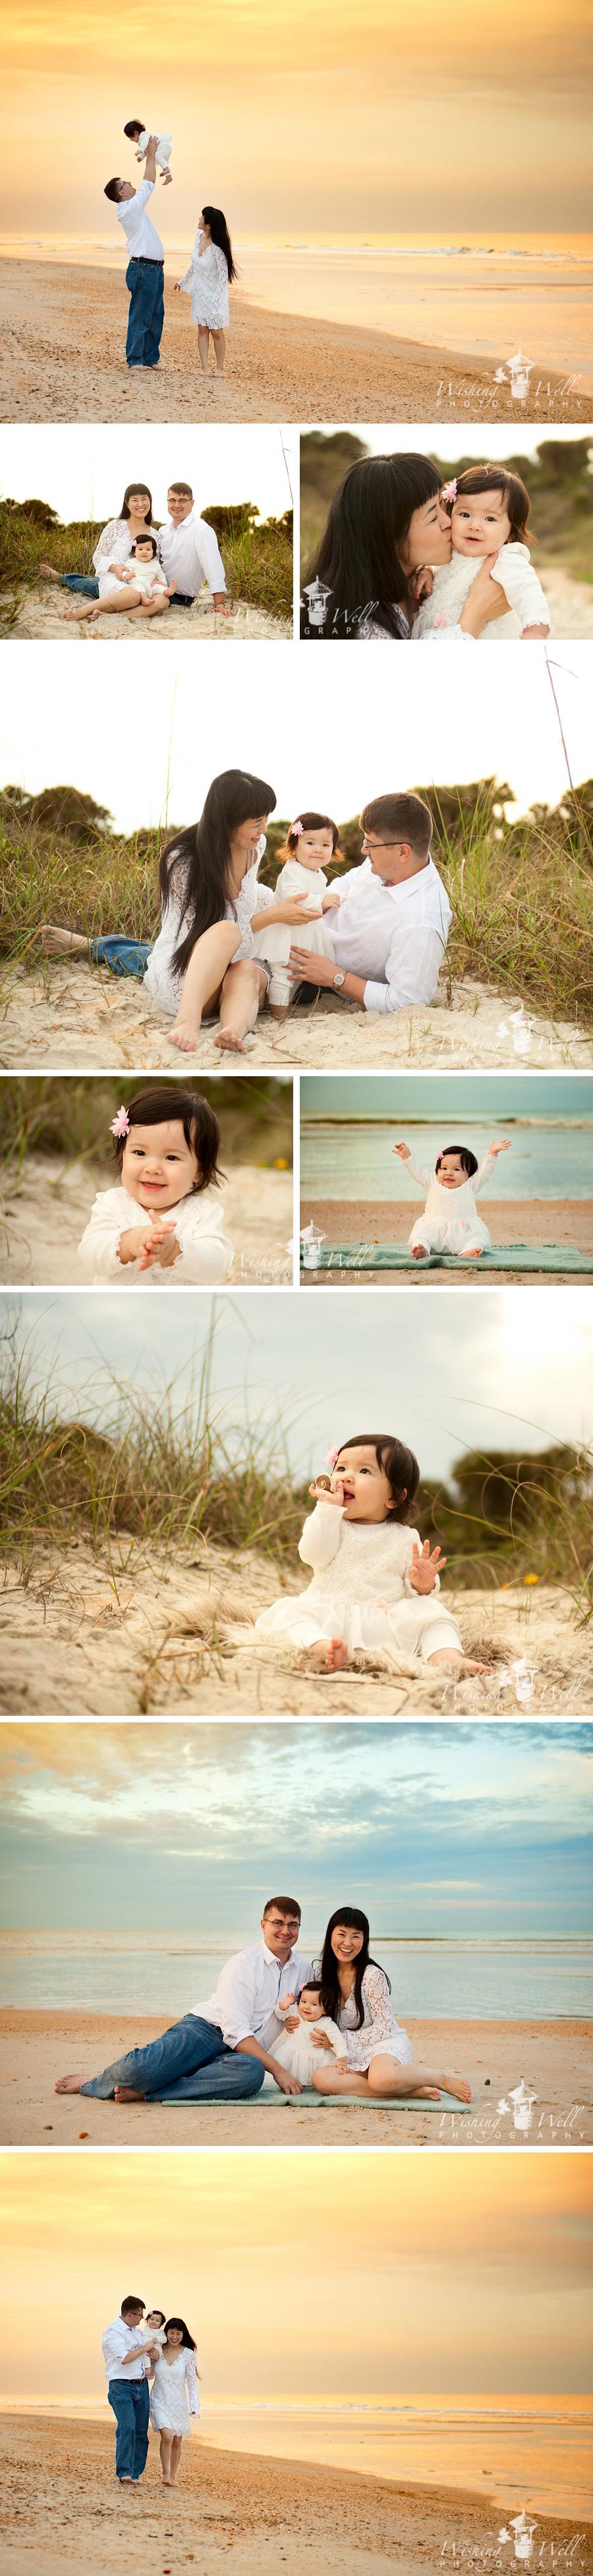 p-family-beach-15